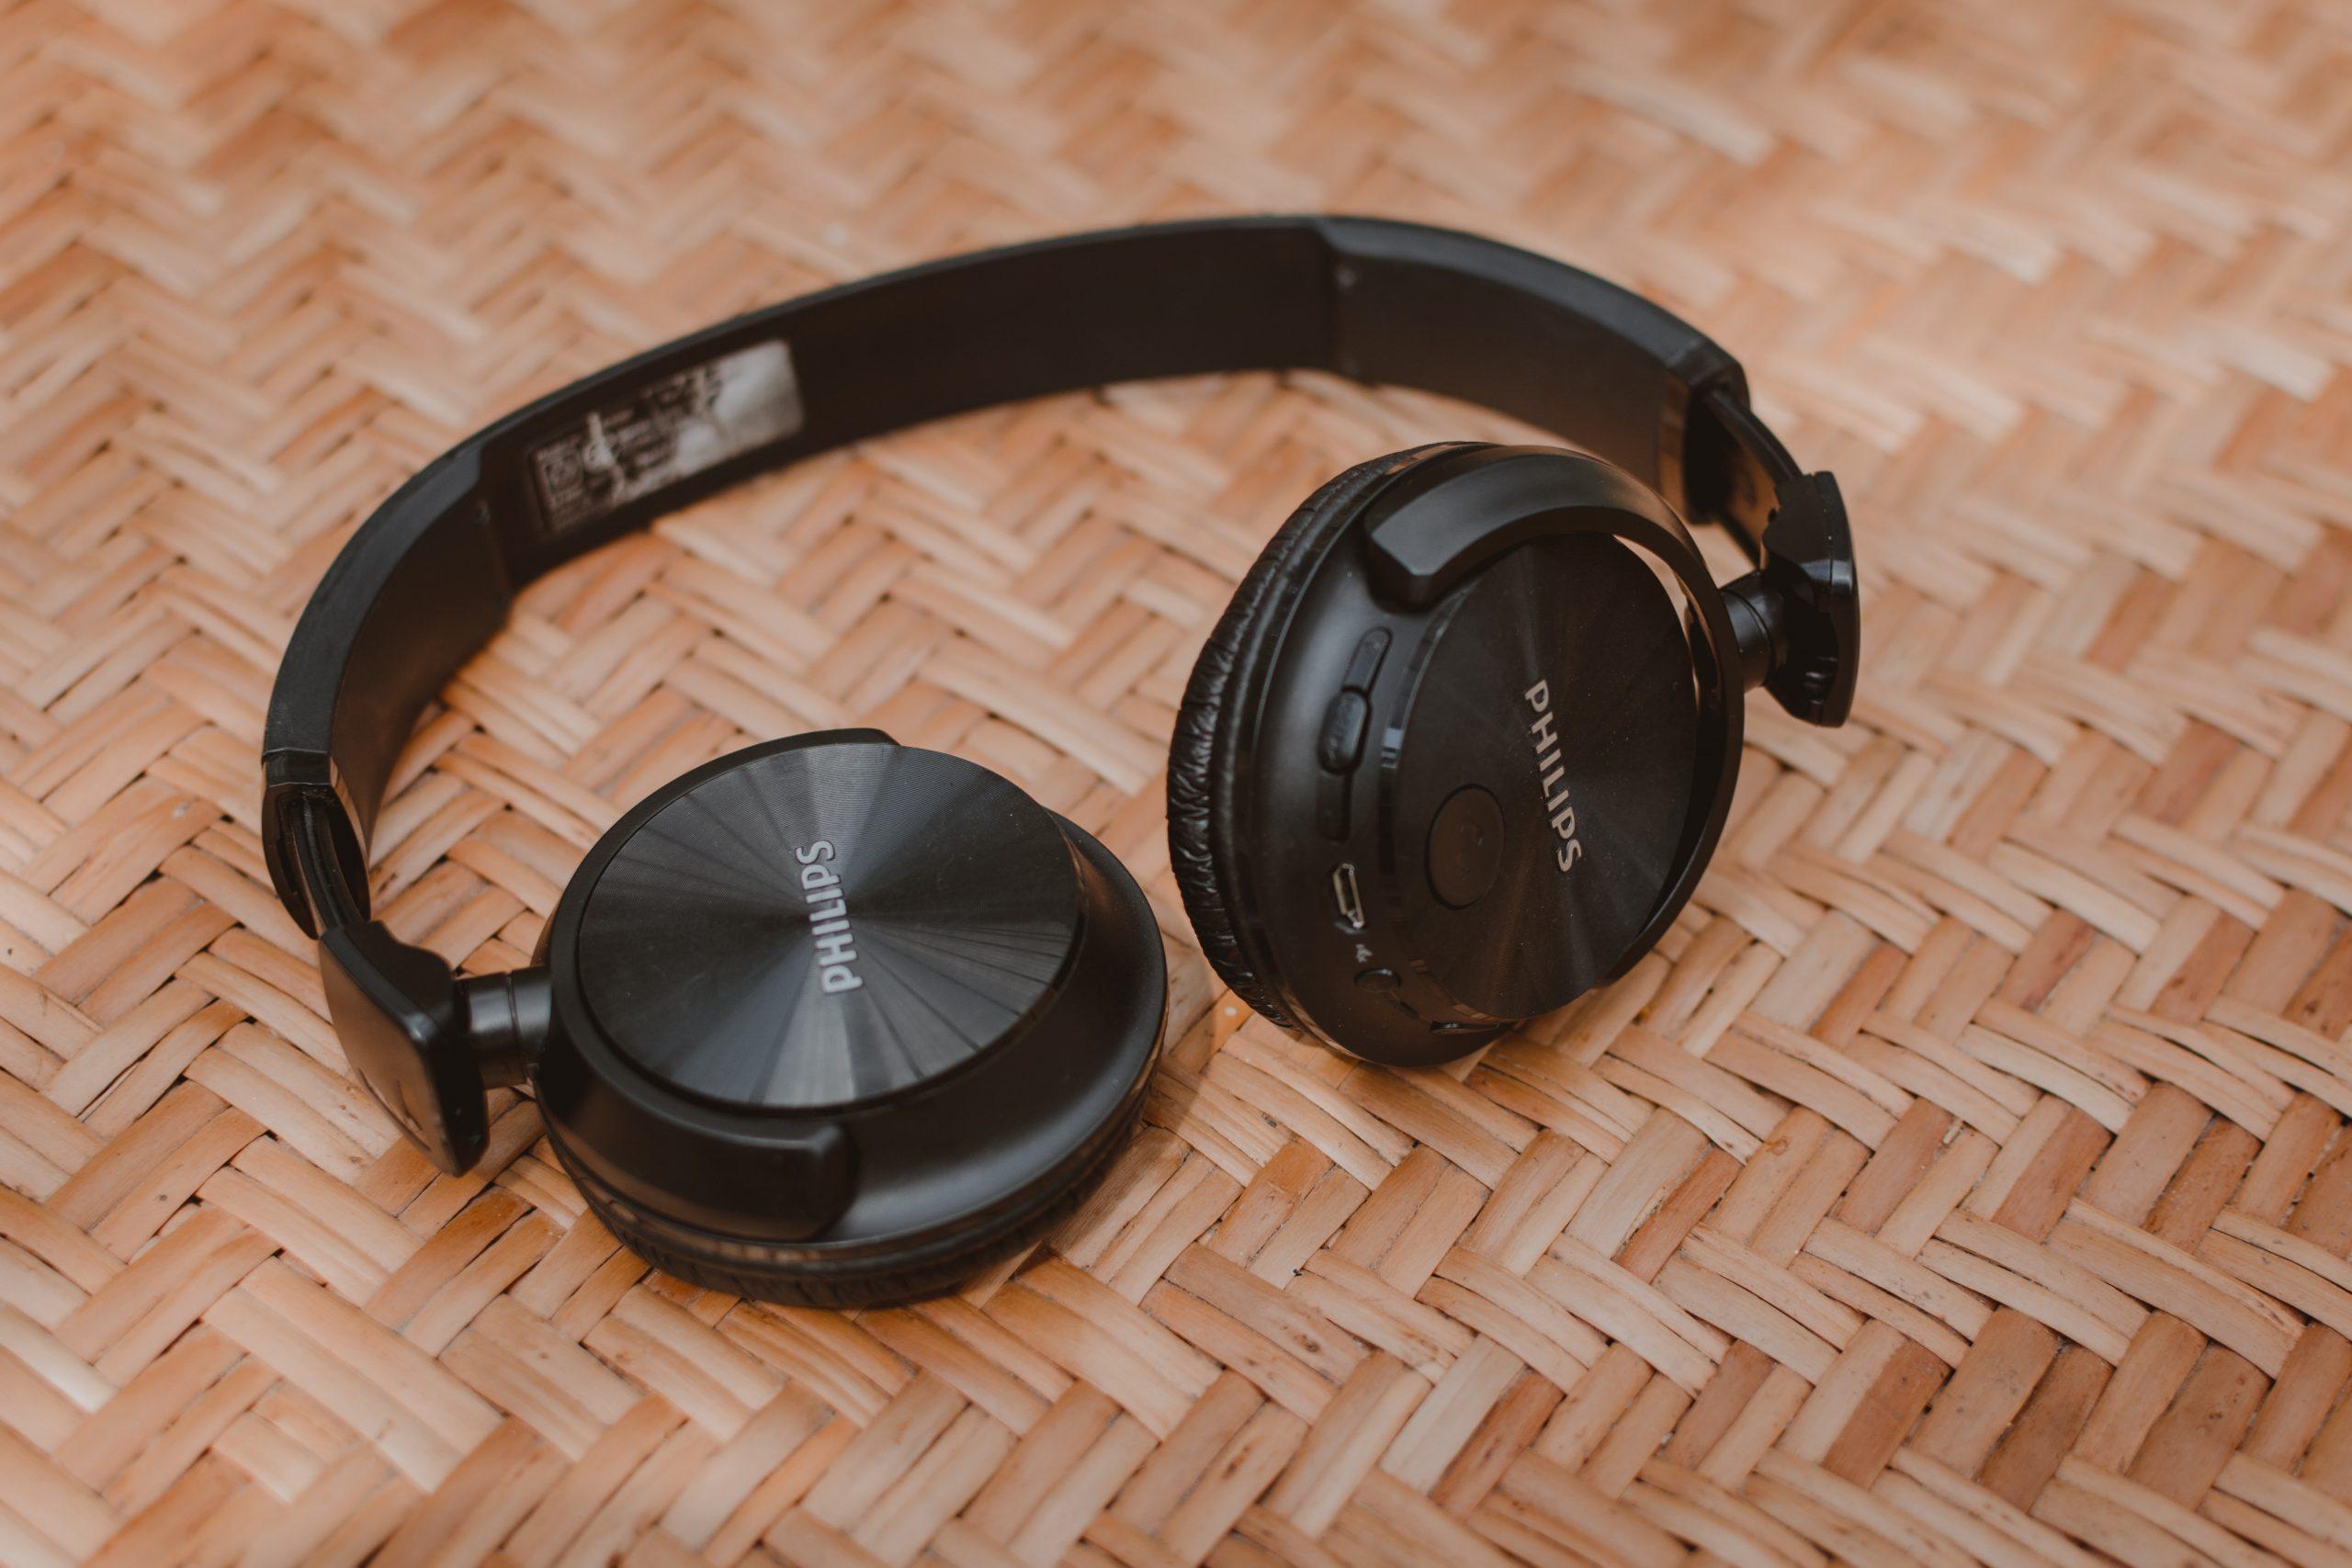 Noise Cancelling Headphones Best Buy 2020